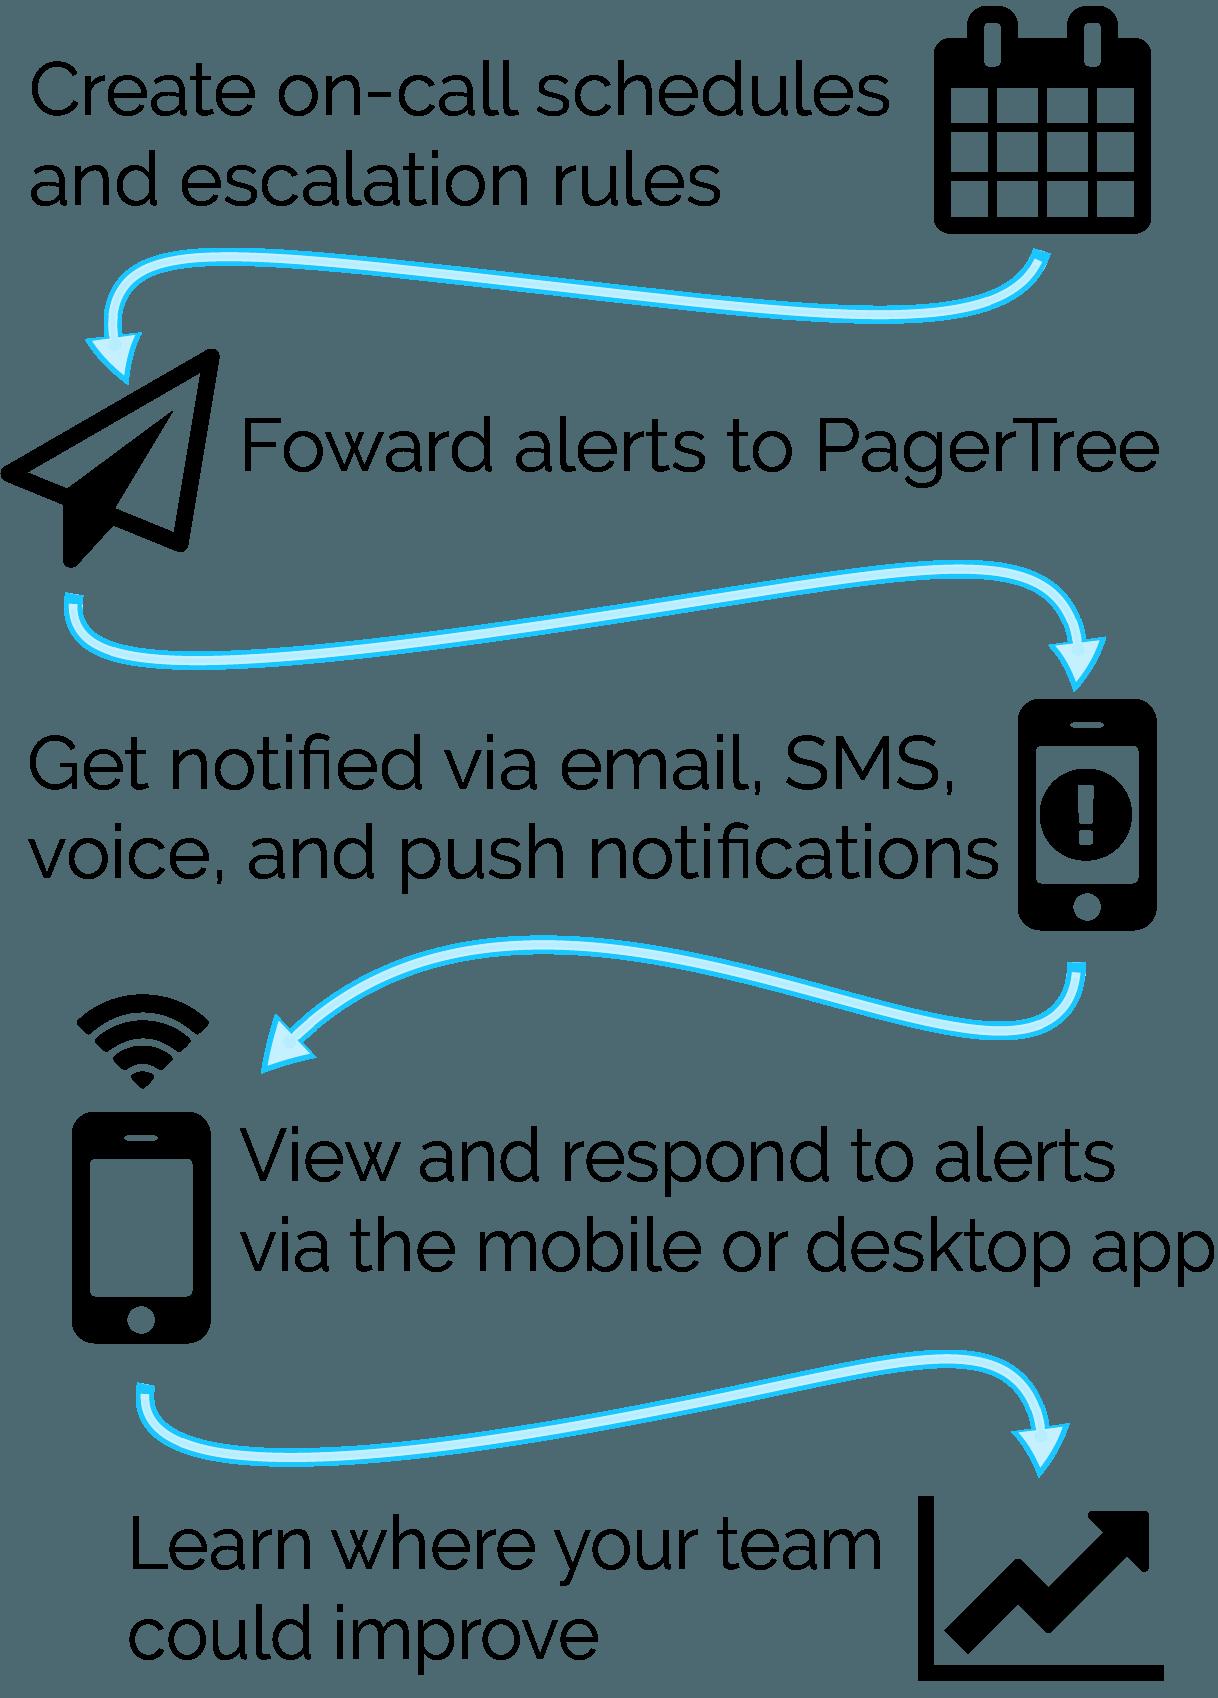 DevOps Incident Management - Alert & Notification | PagerTree